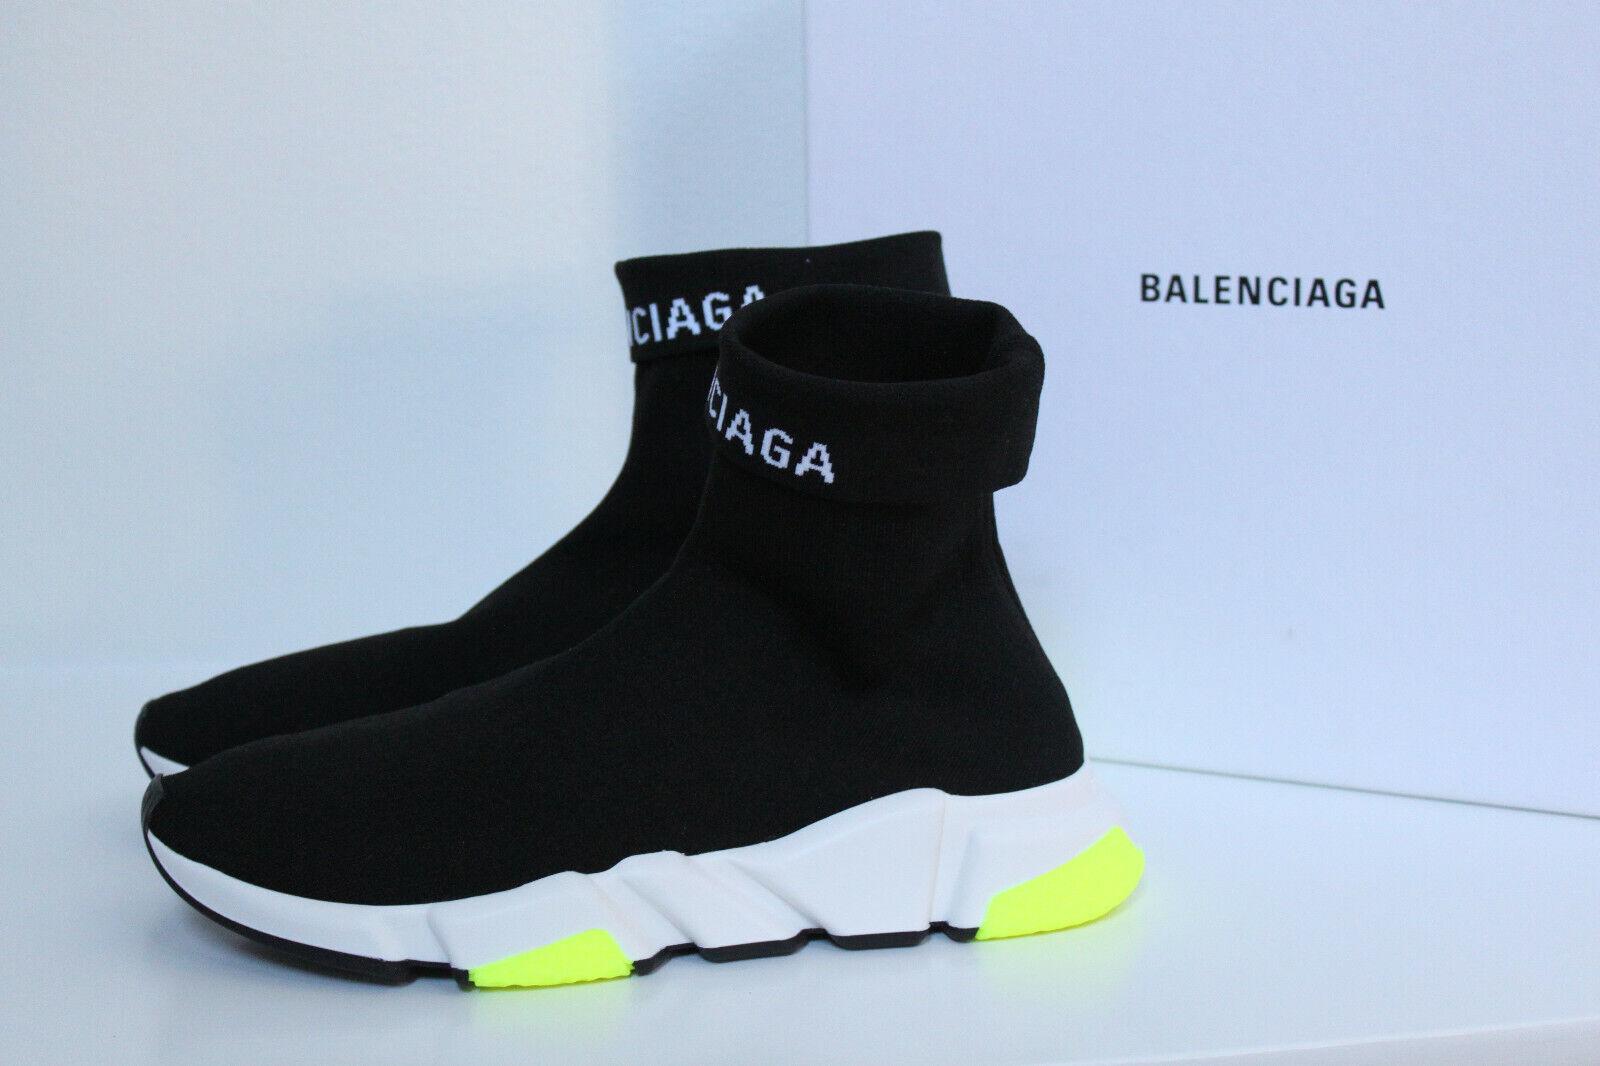 New sz 10 US   43 BALENCIAGA nero Logo Speed High-Top Sock scarpe da ginnastica Men scarpe